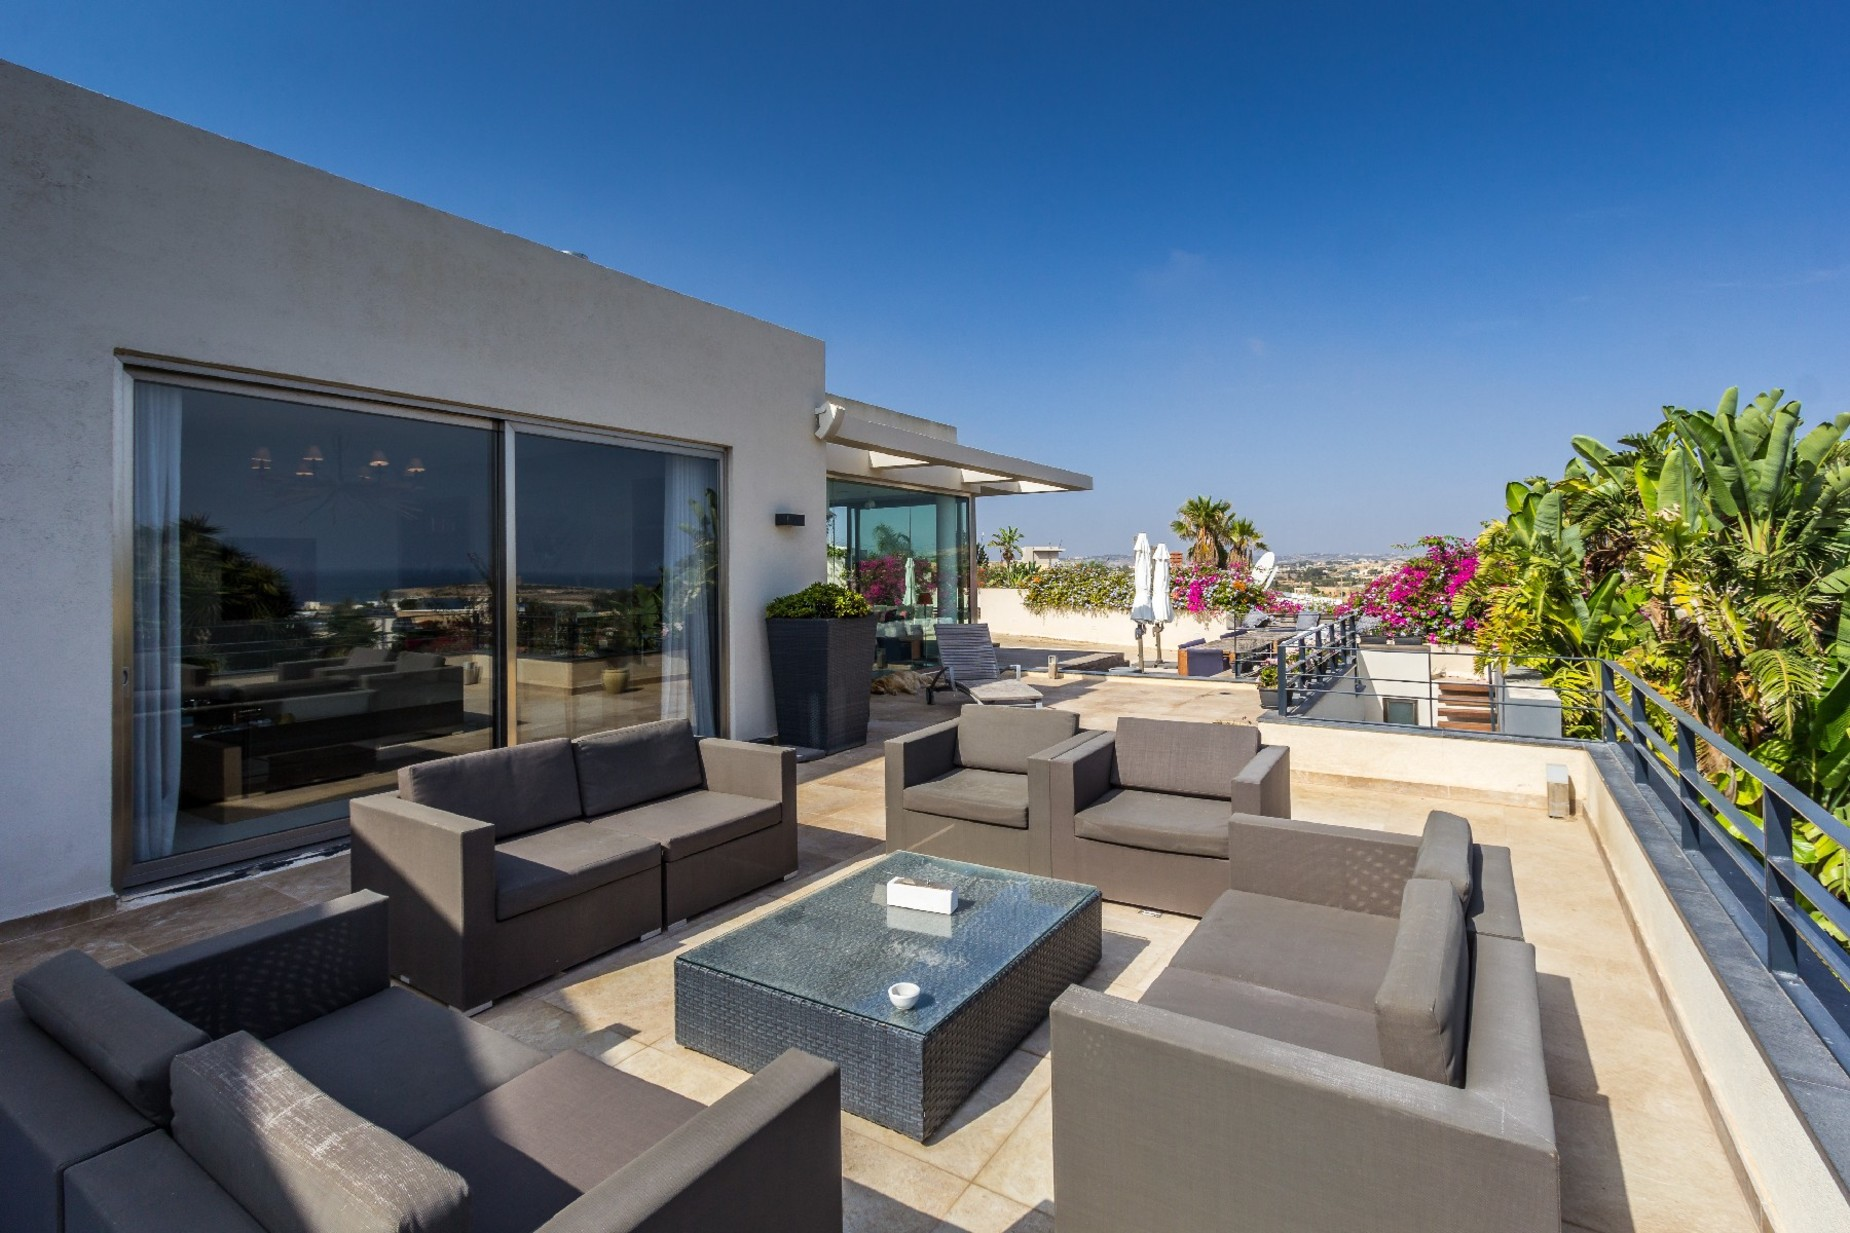 7 bed Villa For Sale in Bahar ic-Caghaq, Bahar ic-Caghaq - thumb 8